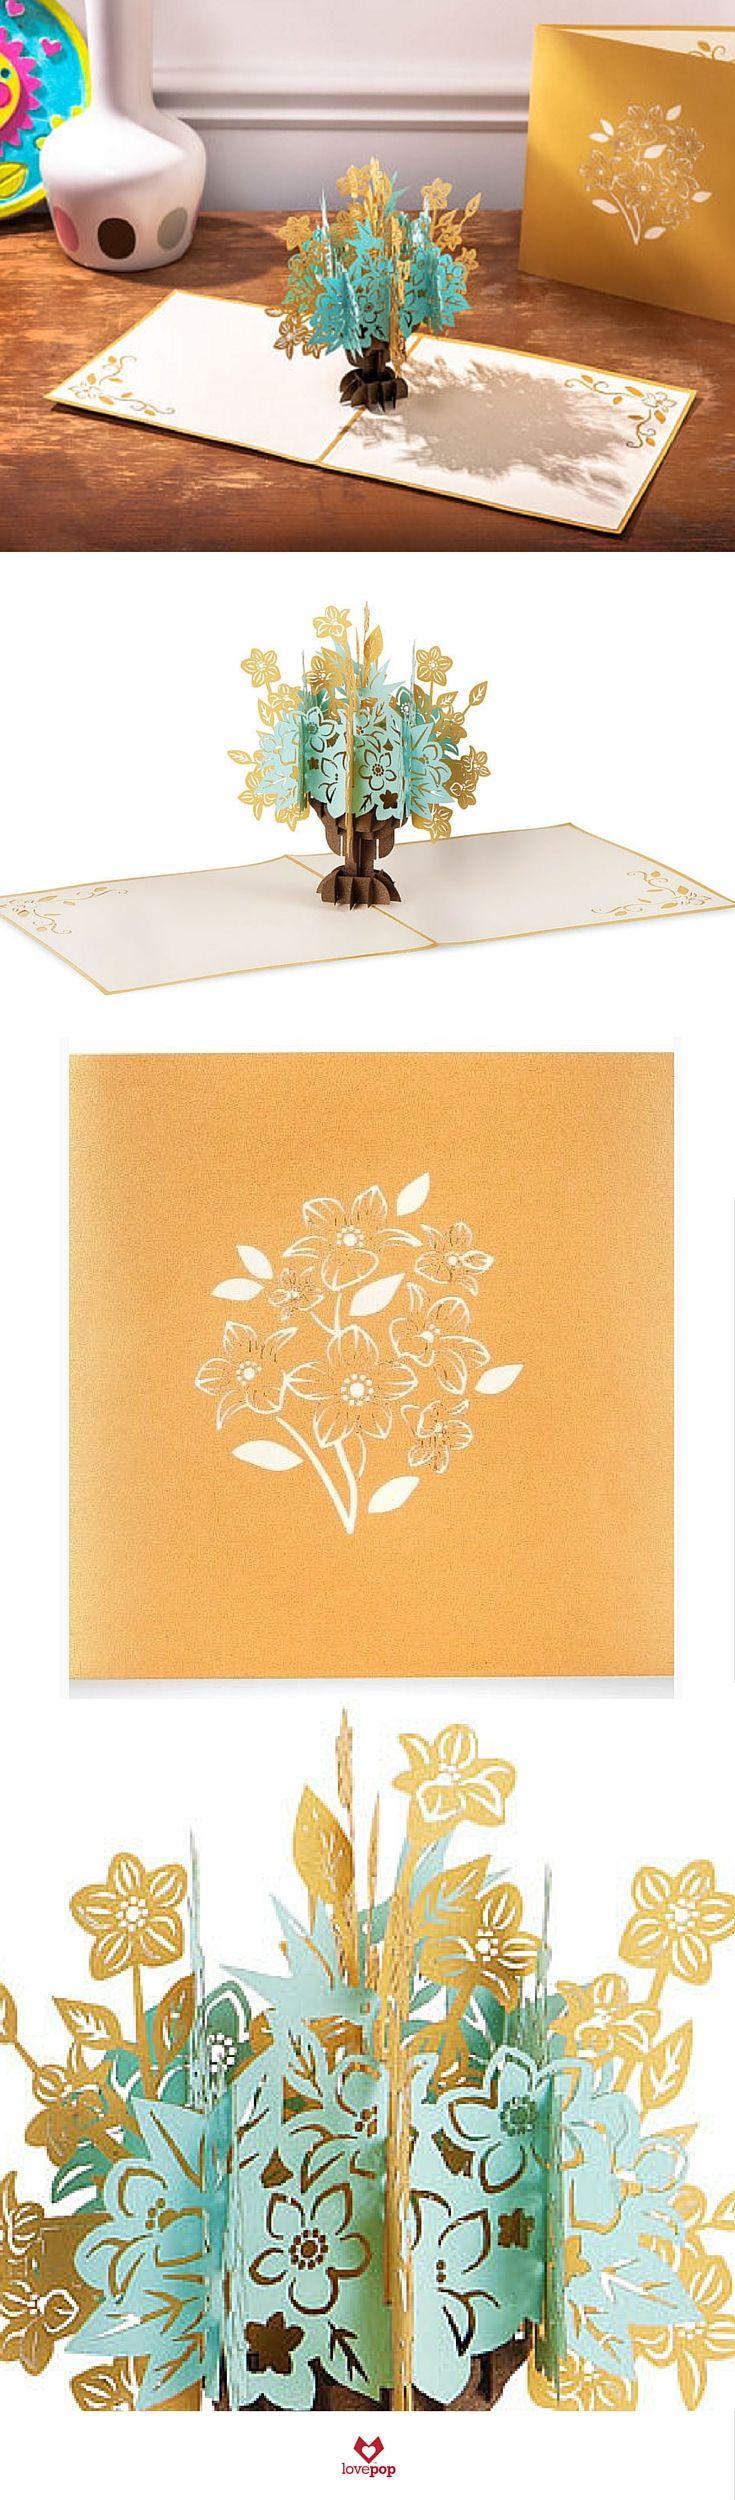 bouquet of flowers pop up card template